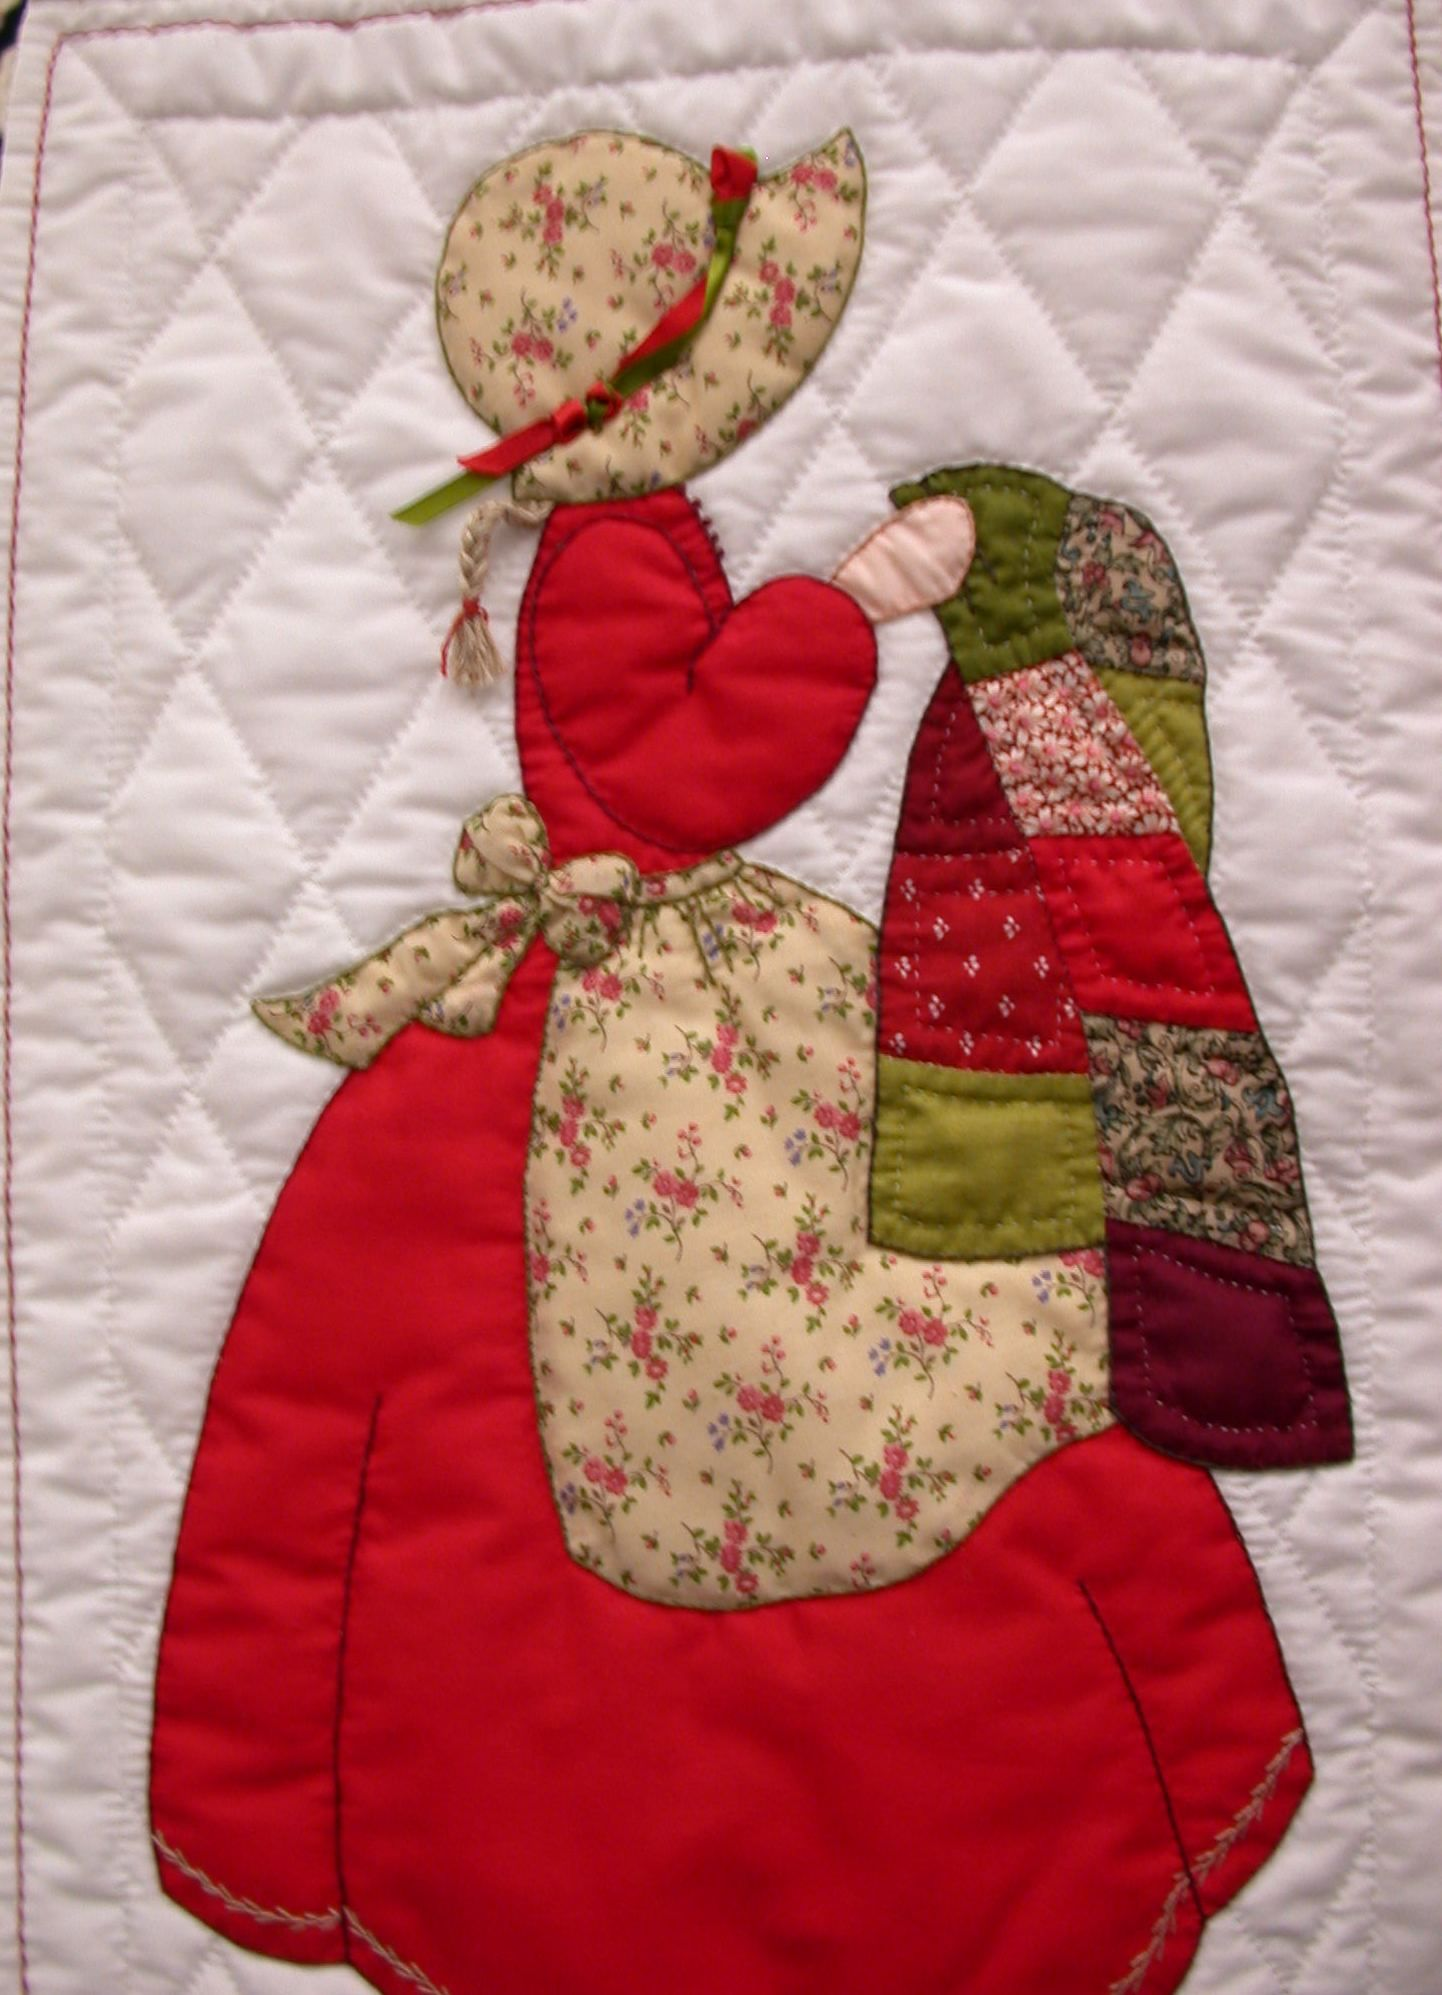 fce988751 Bonnet Girls Quilt Patterns | pattern ordering and general information  luannburke @ bonnetgirls com .